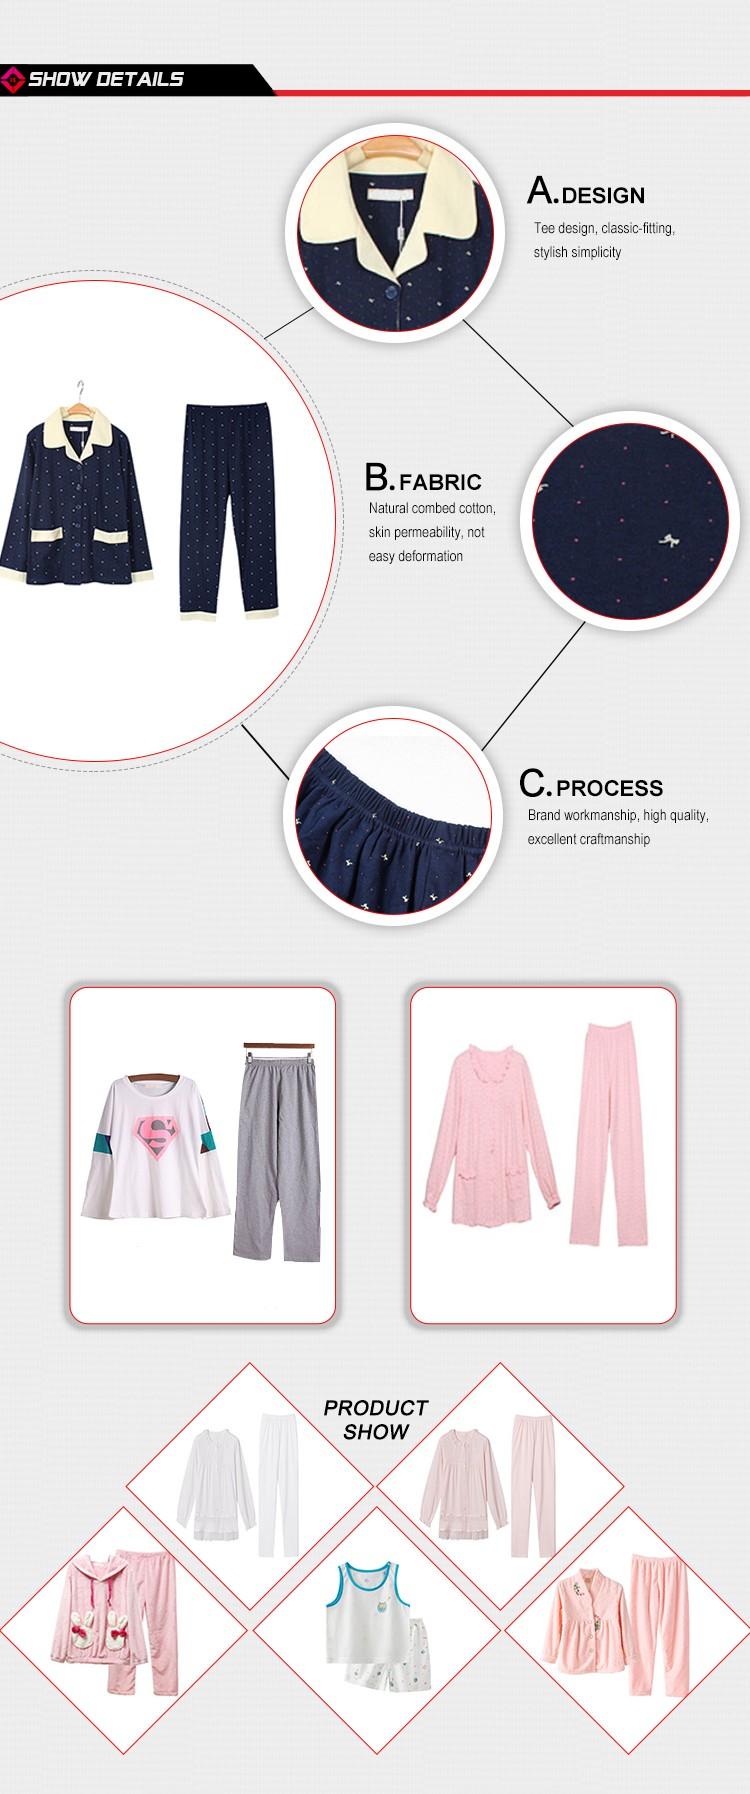 Design your own t shirt good quality - Design Your Own T Shirt Man T Shirt Custom T Shirt And Shorts